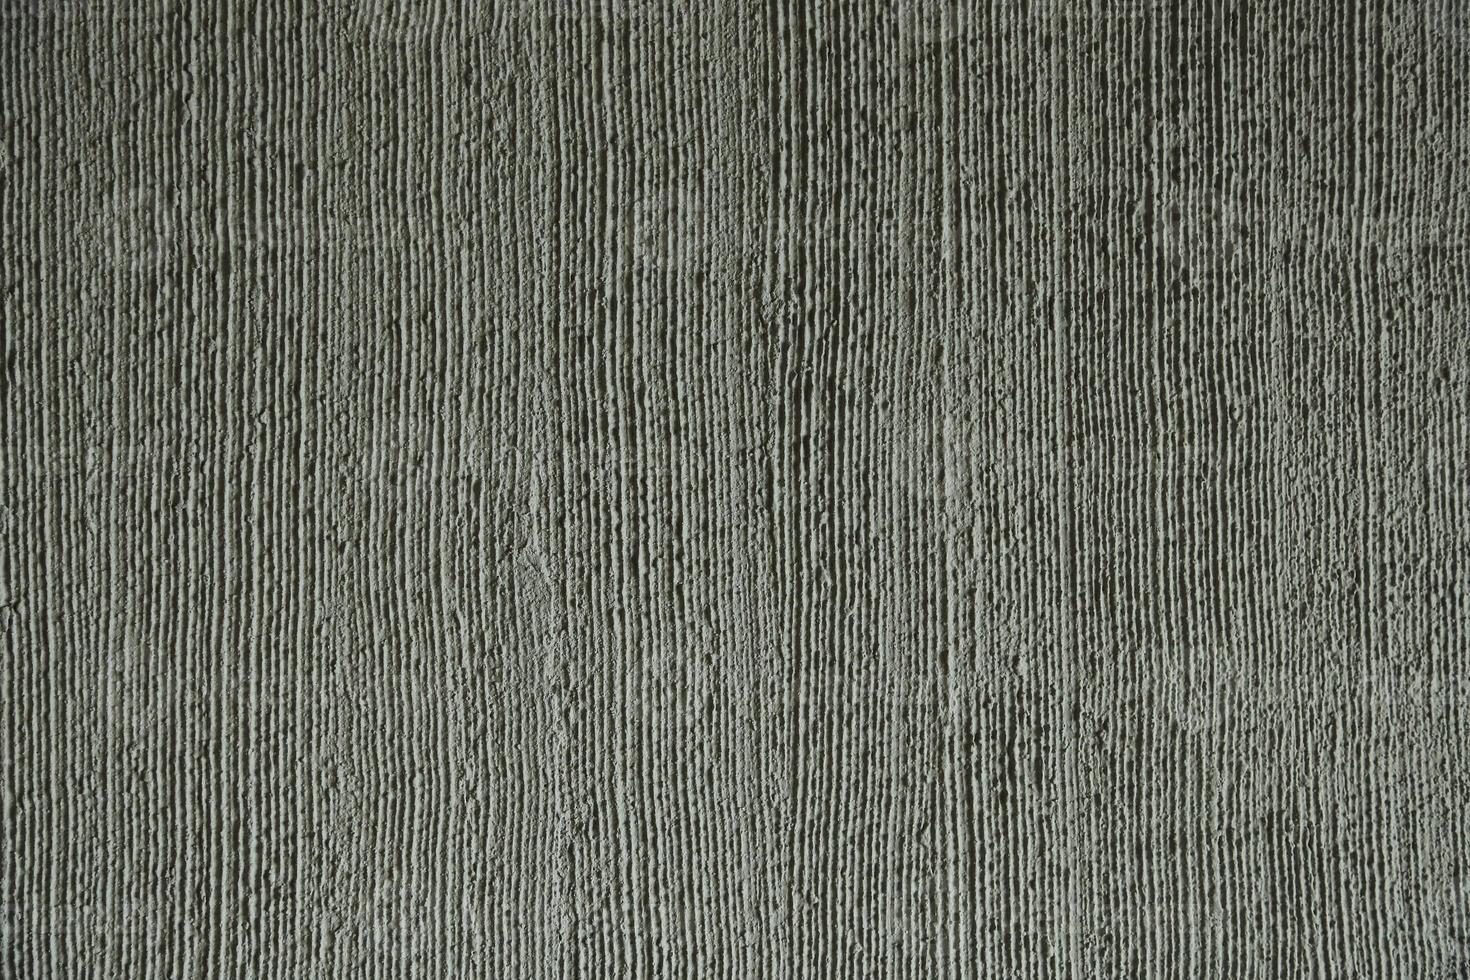 Fondo de pared con textura grunge foto